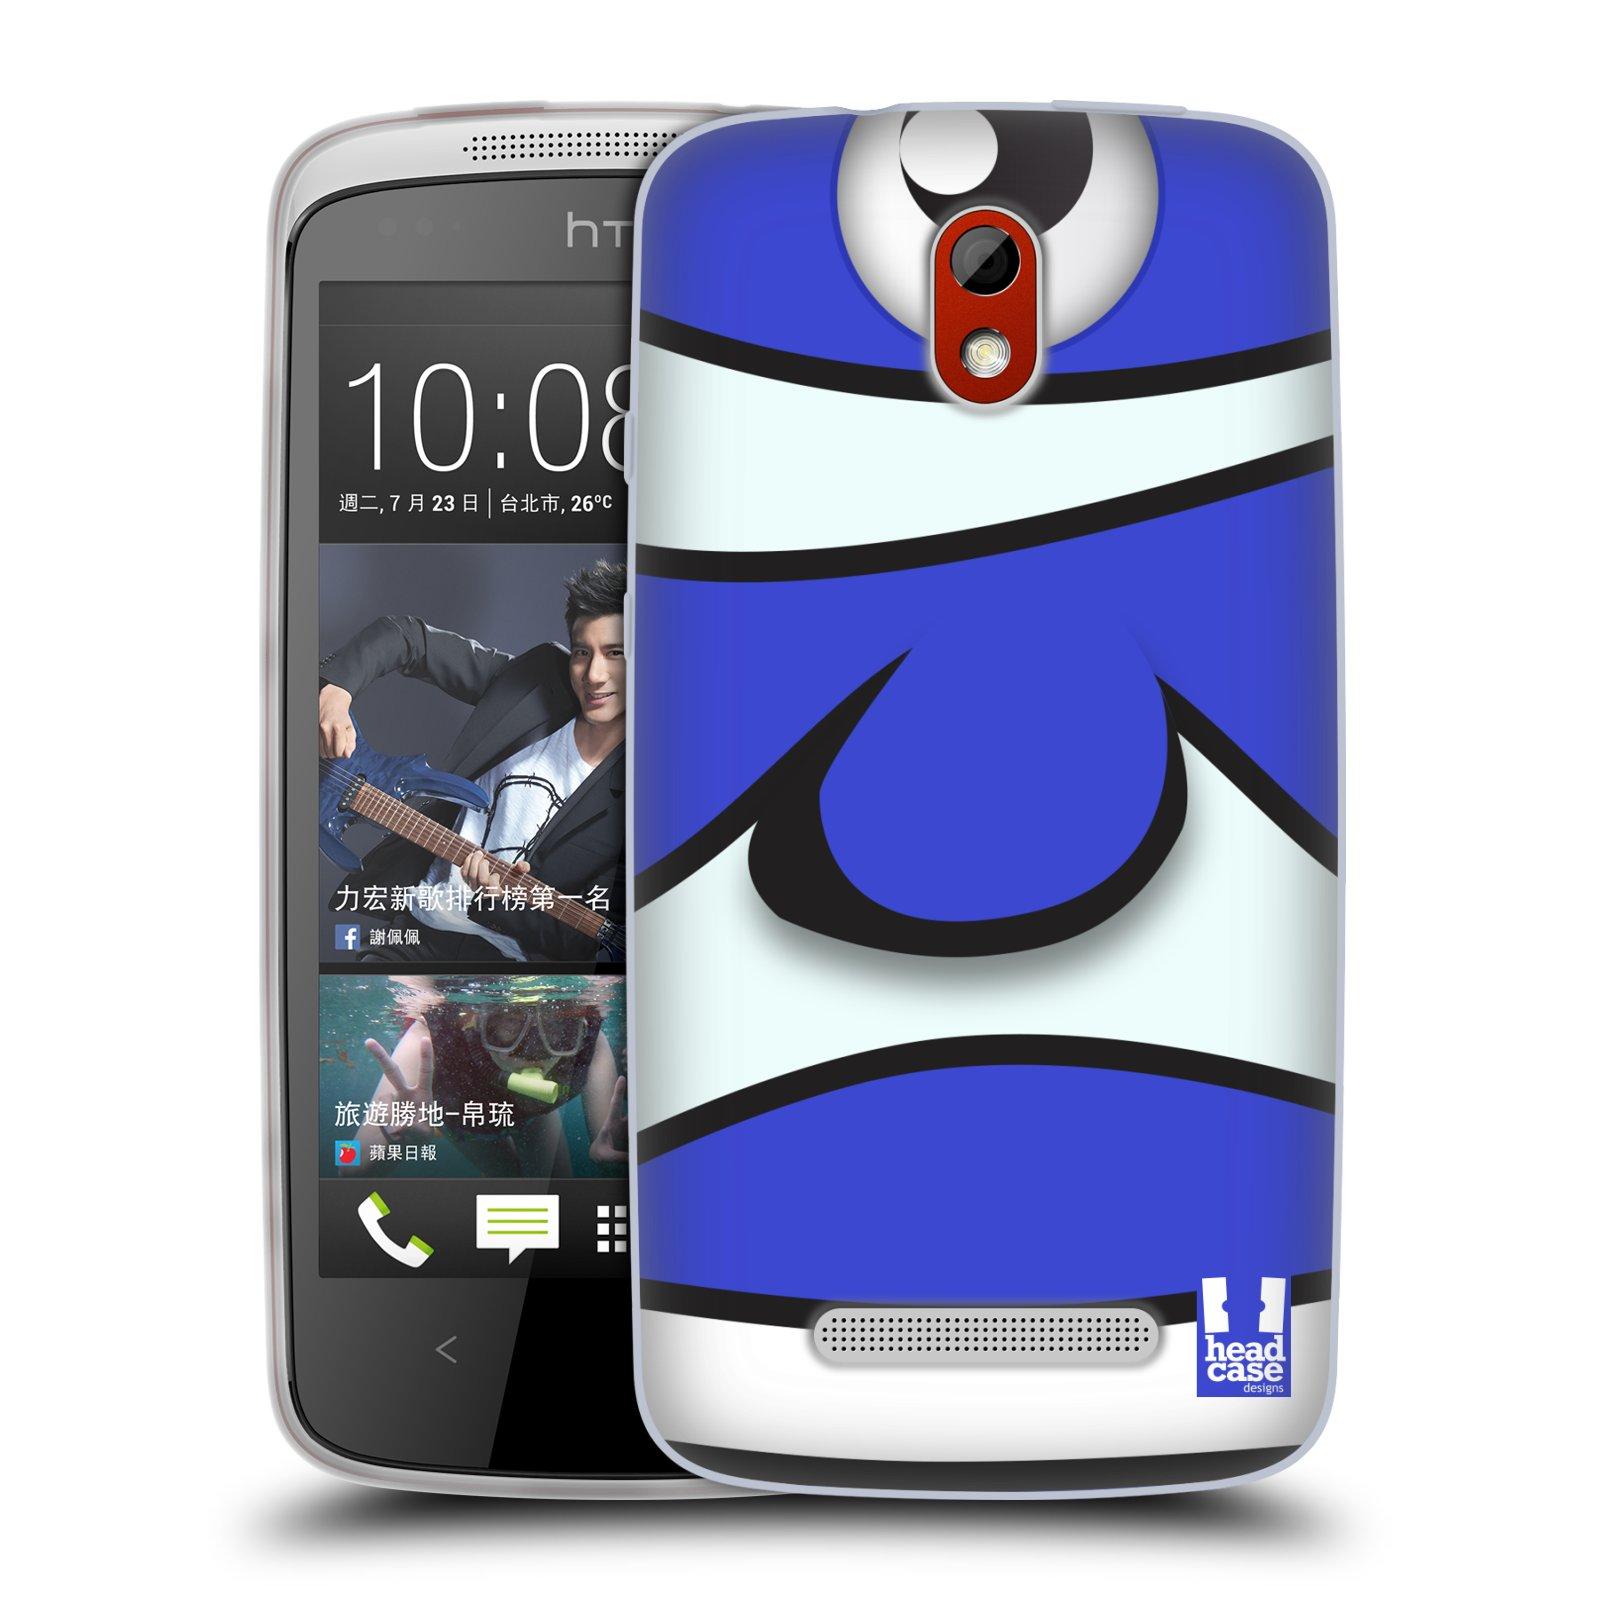 HEAD CASE silikonový obal na mobil HTC DESIRE 500 vzor Rybičky z profilu modrý klaun